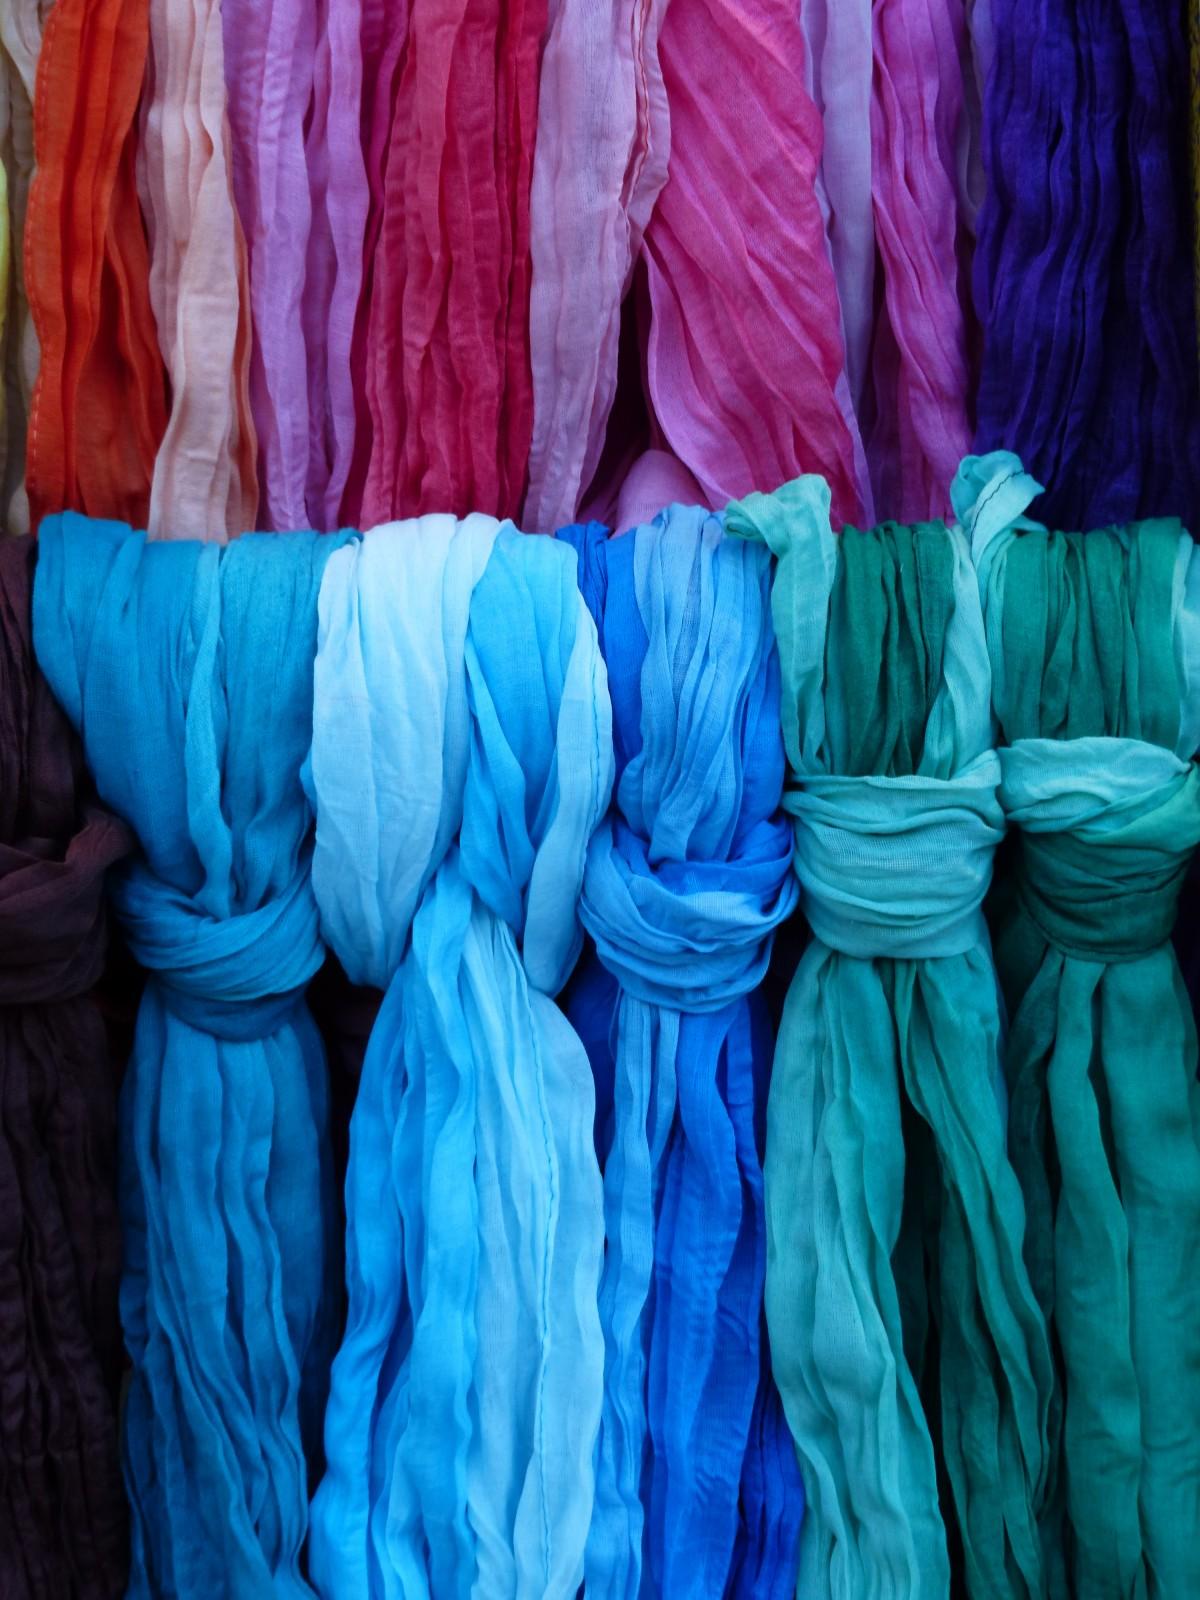 Free Images : shop, color, market, blue, clothing ...